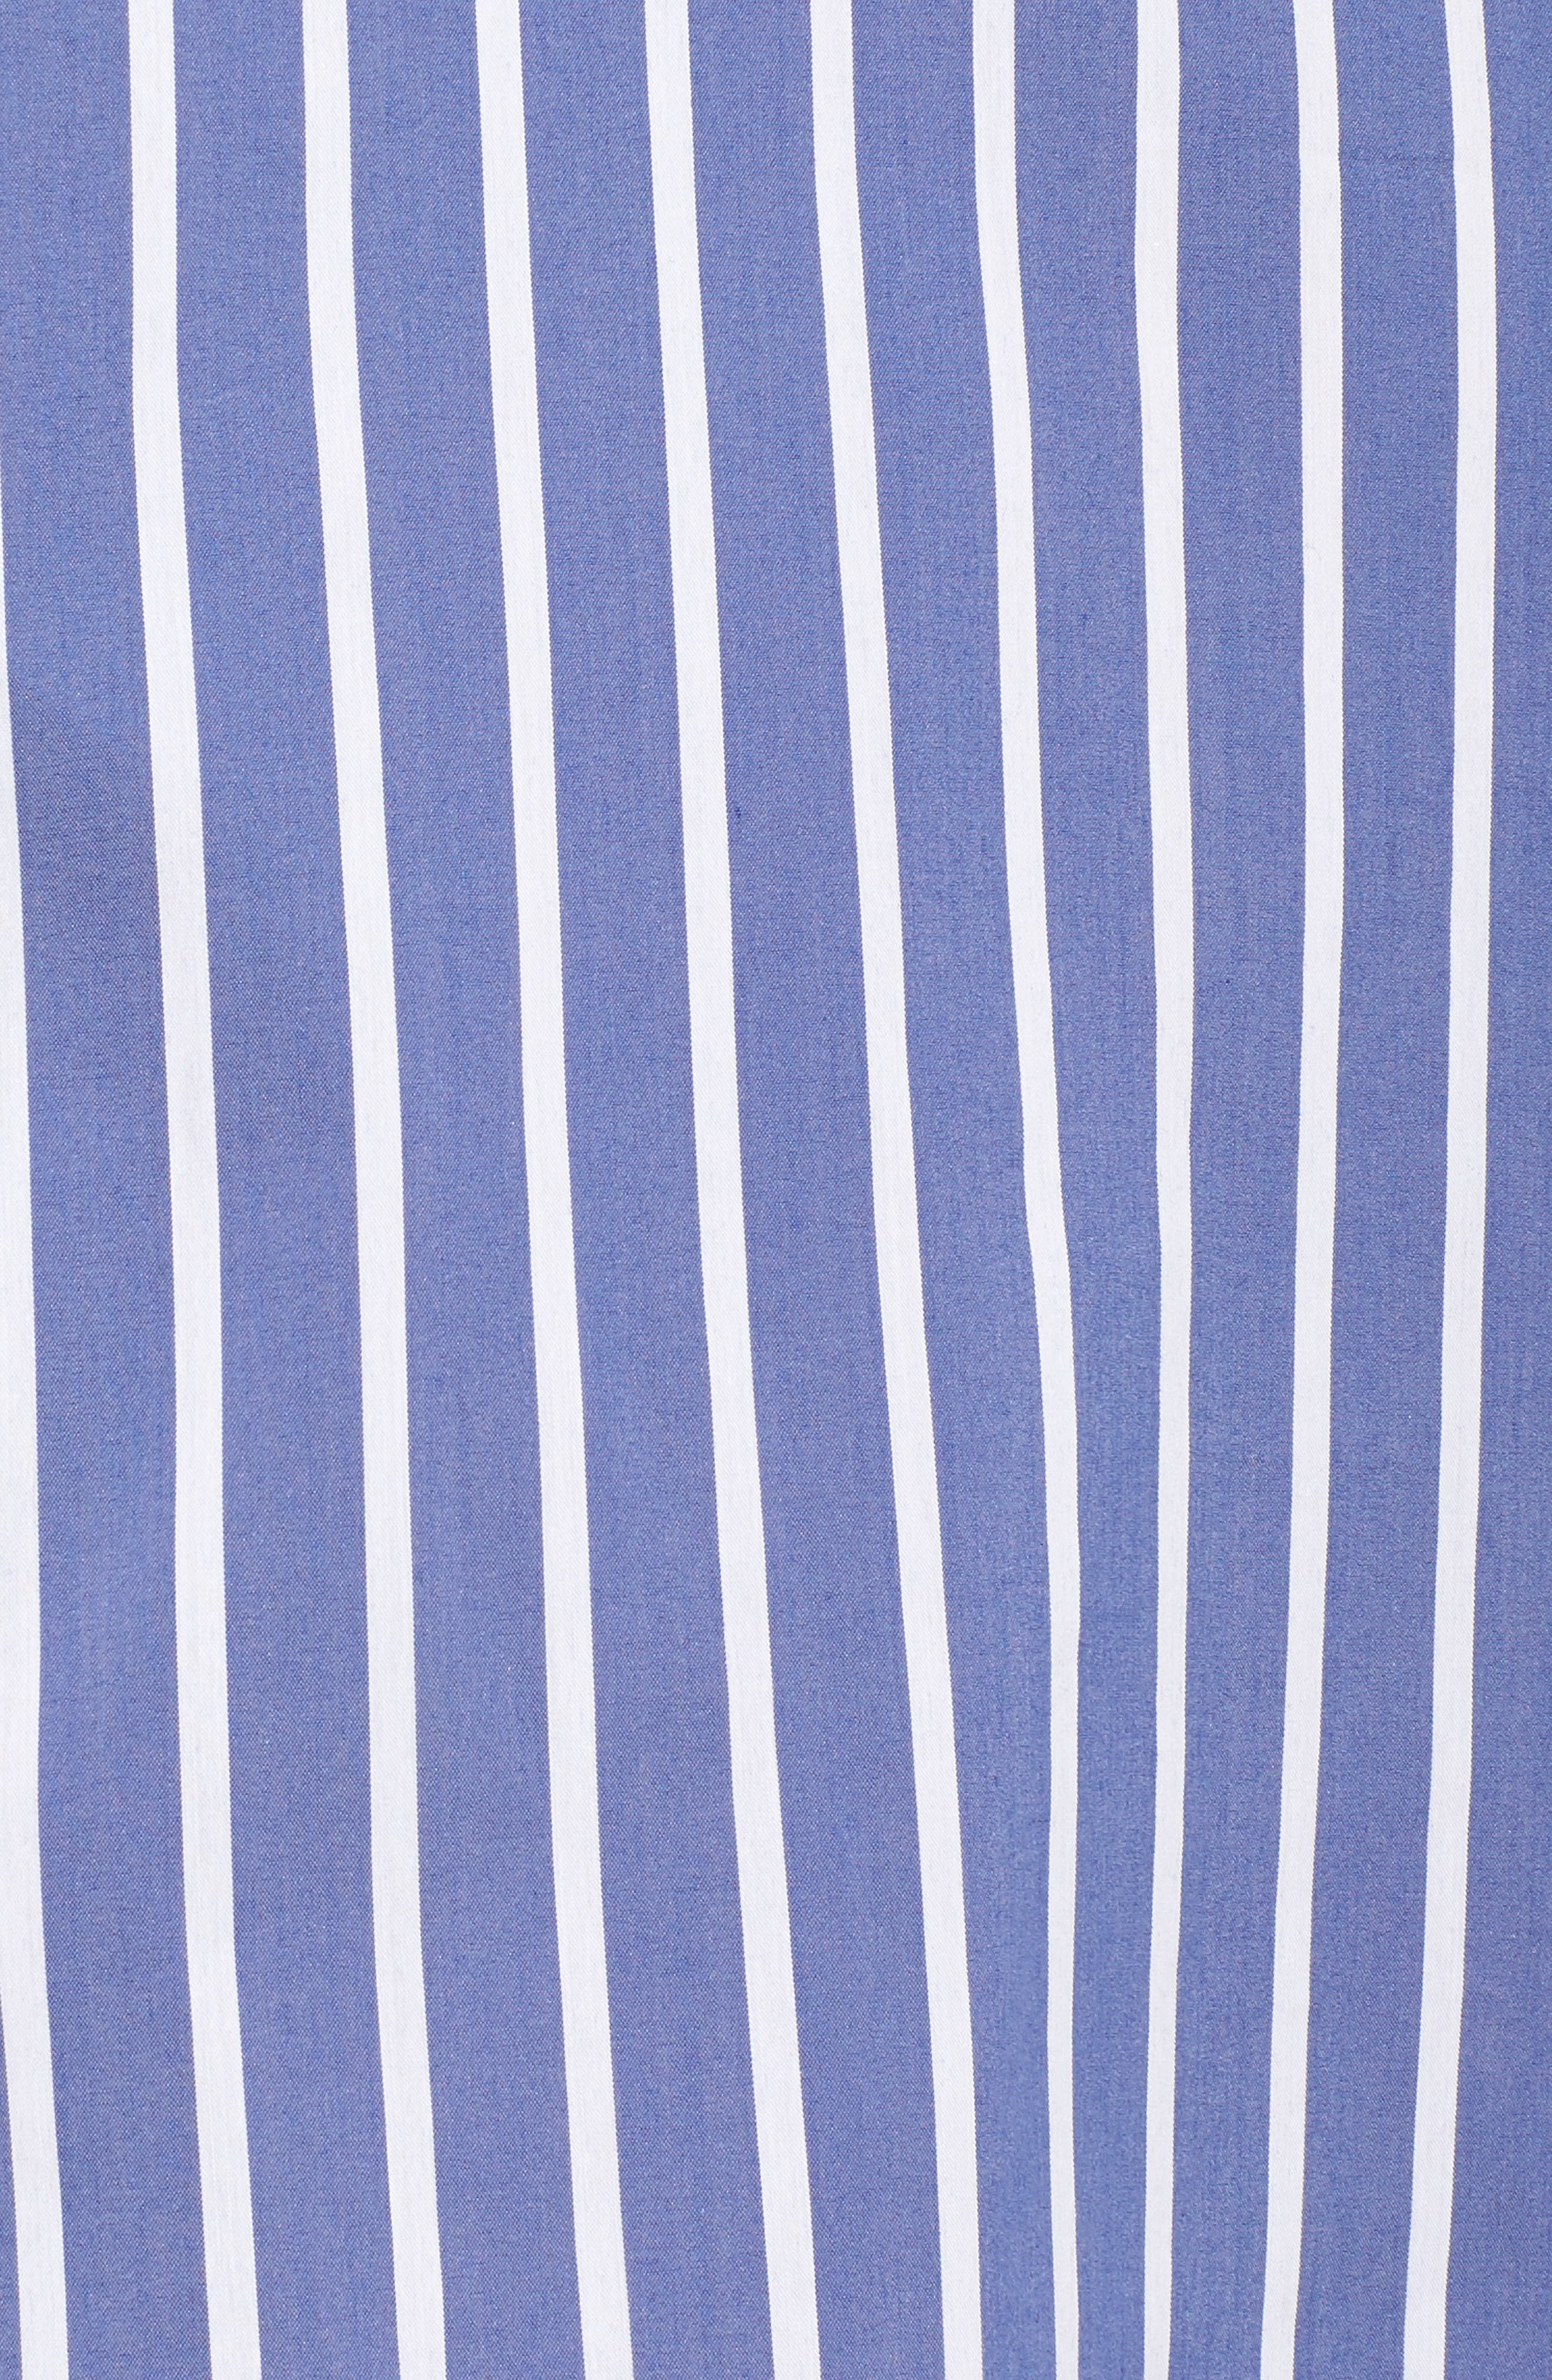 Ruffle Stripe Shirtdress,                             Alternate thumbnail 5, color,                             Blue White Stripe